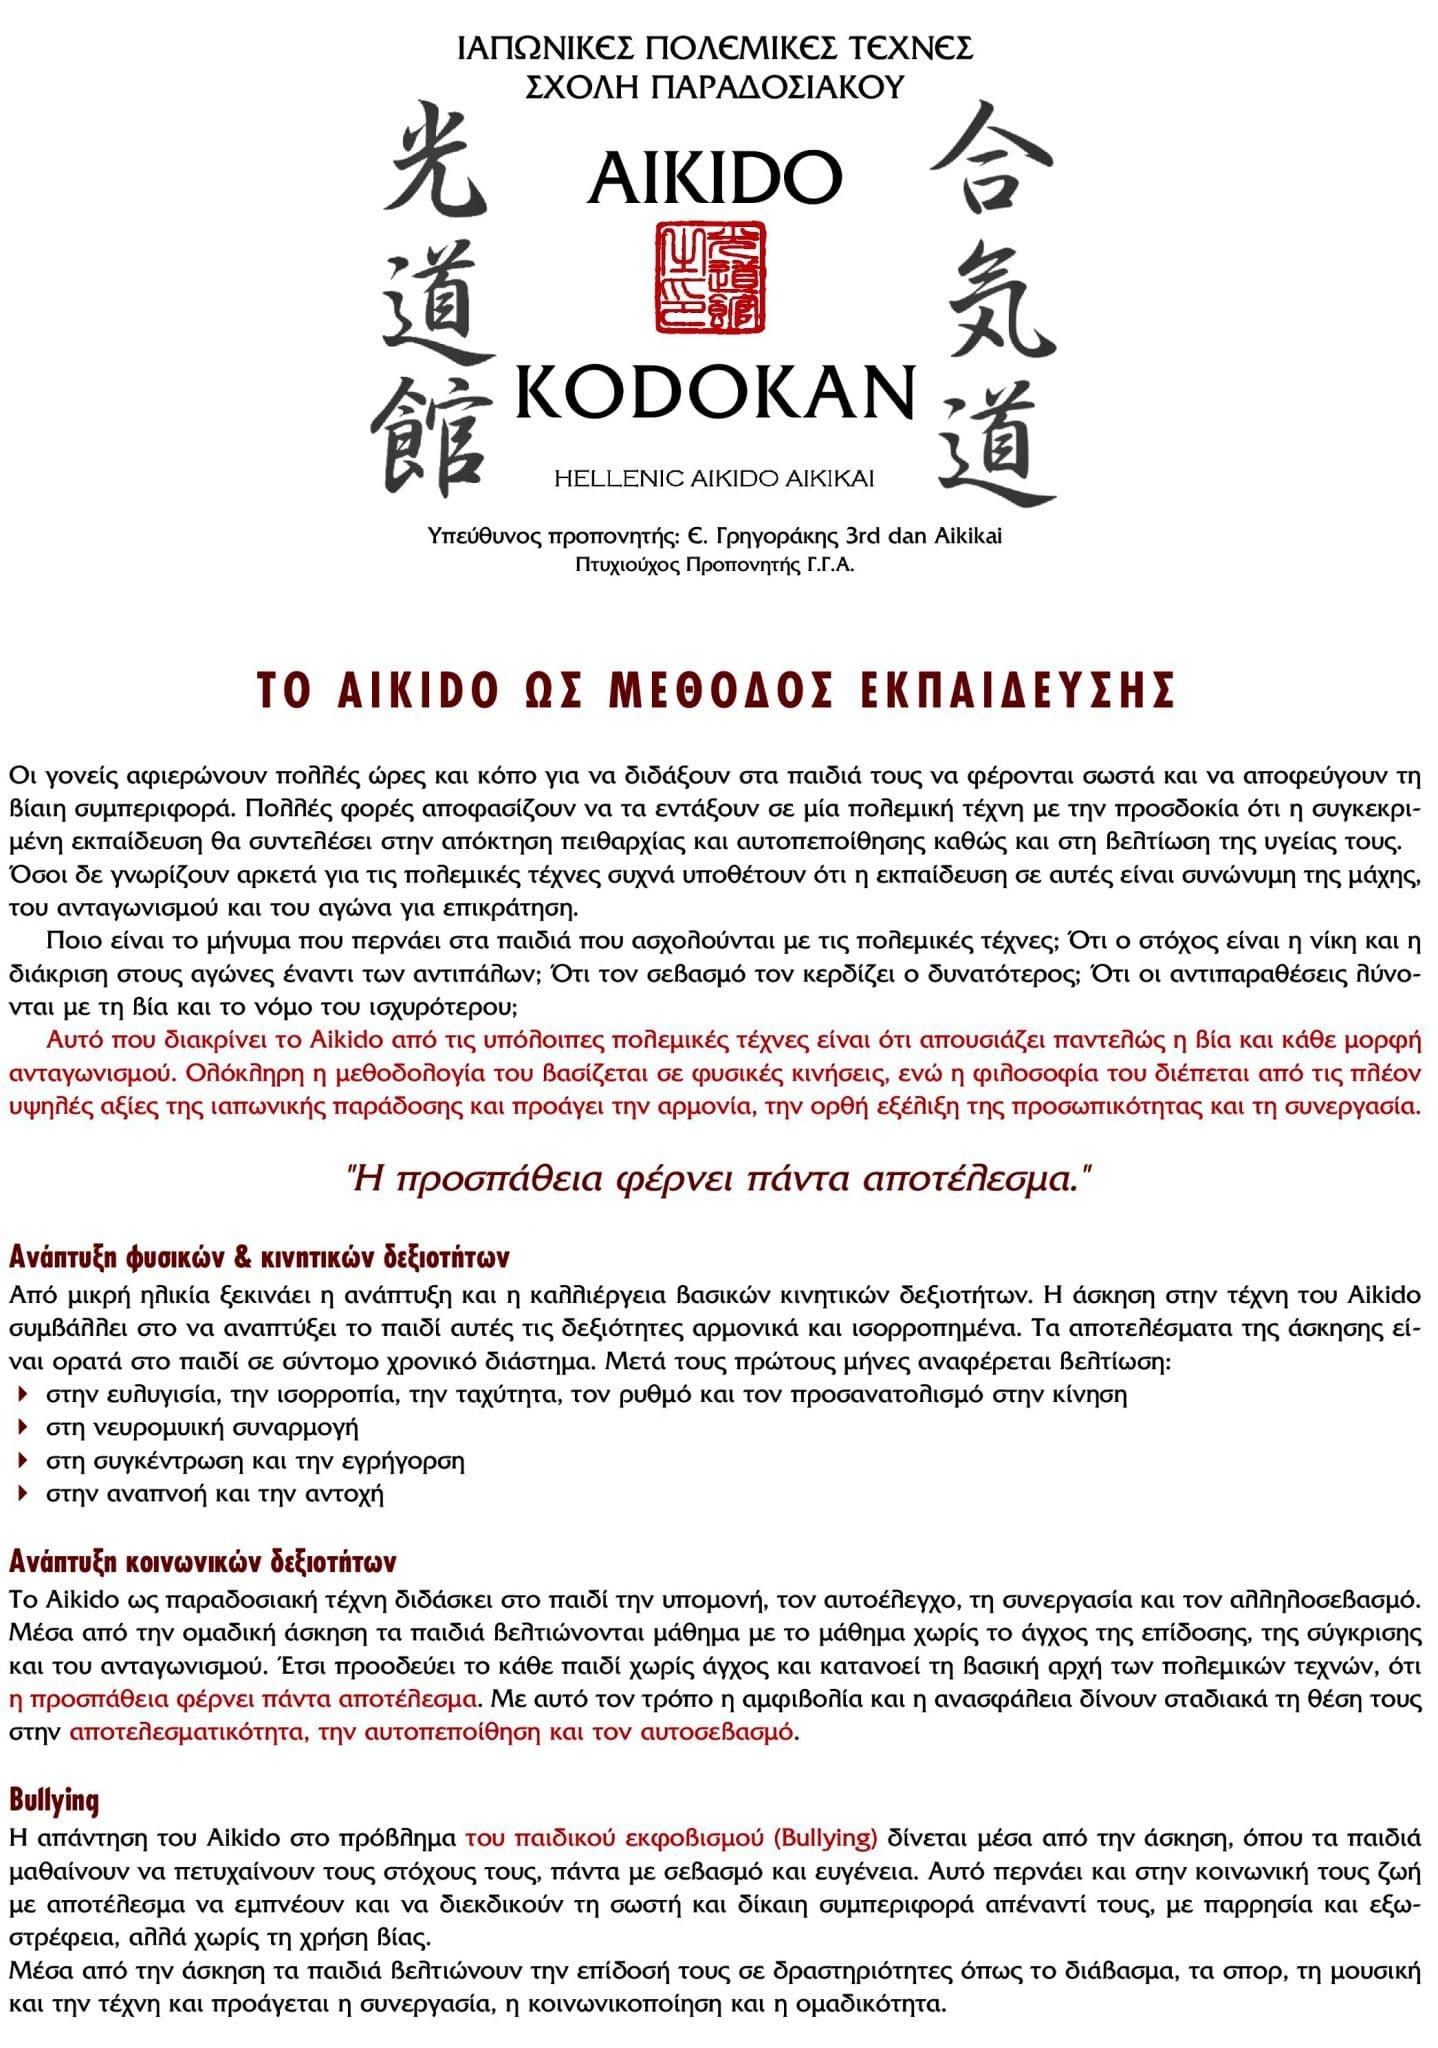 To Aikido ως μέθοδος εκπαίδευσης των παιδιών